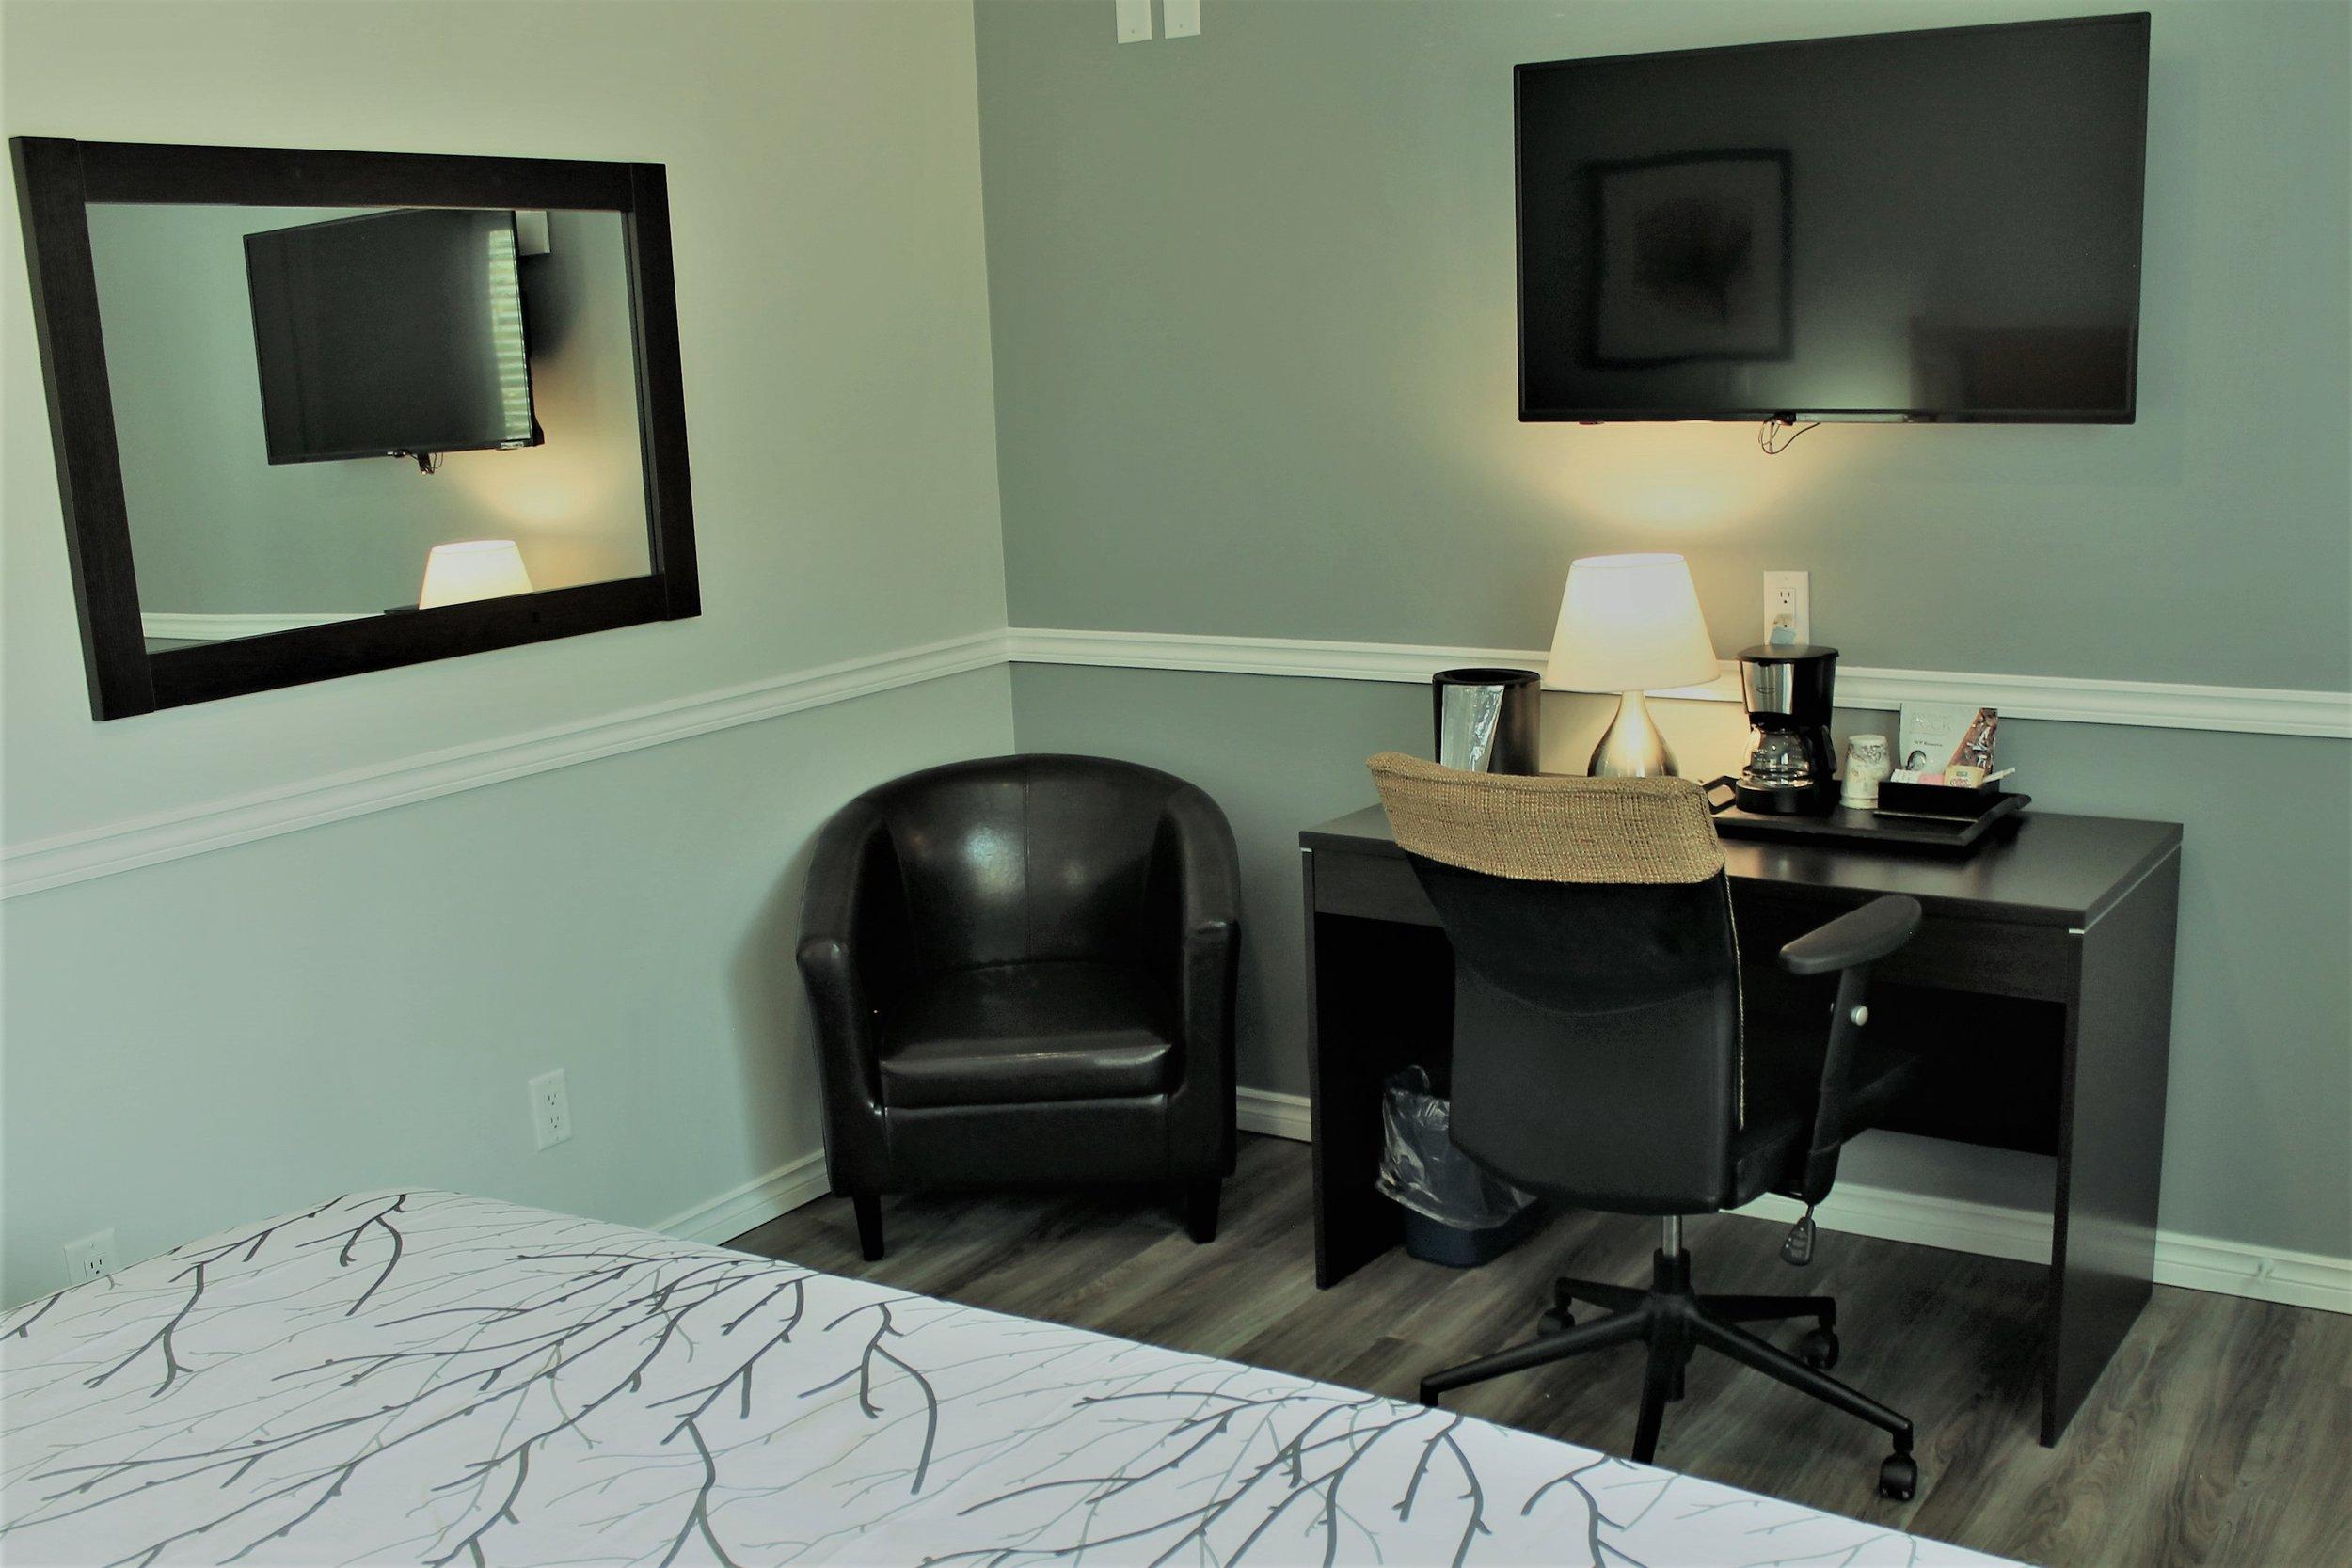 New King Room - Live large ! You deserve it.